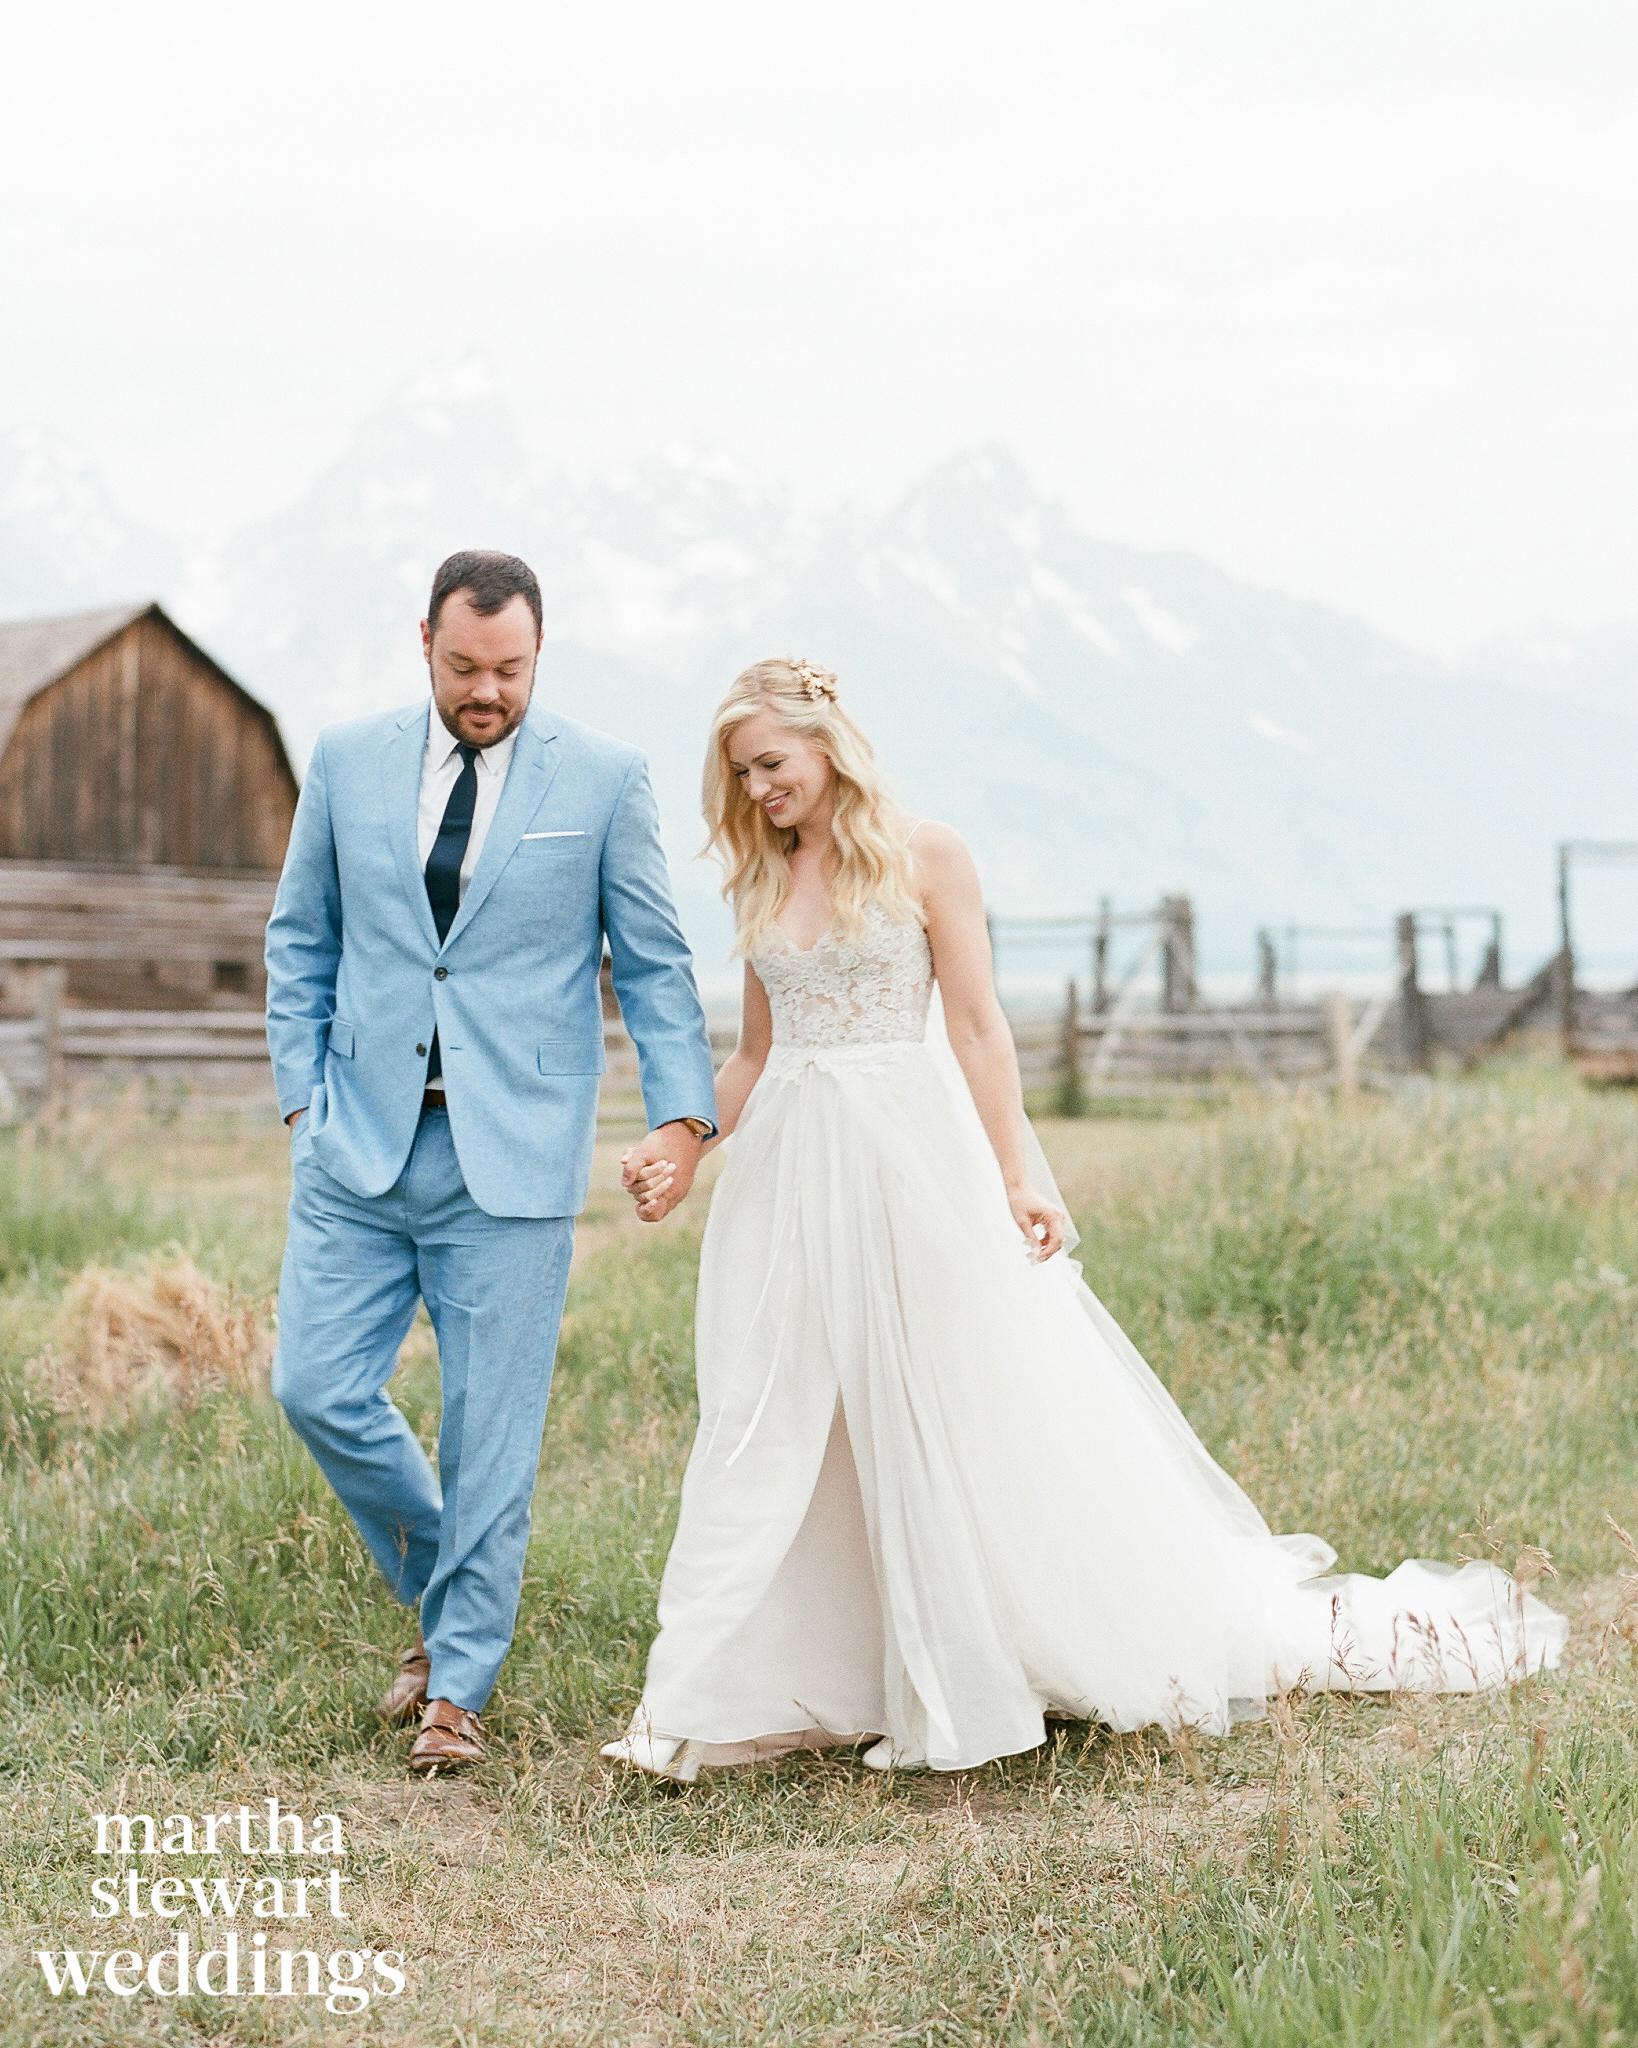 beth behrs michael gladis wedding couple sylvie gil